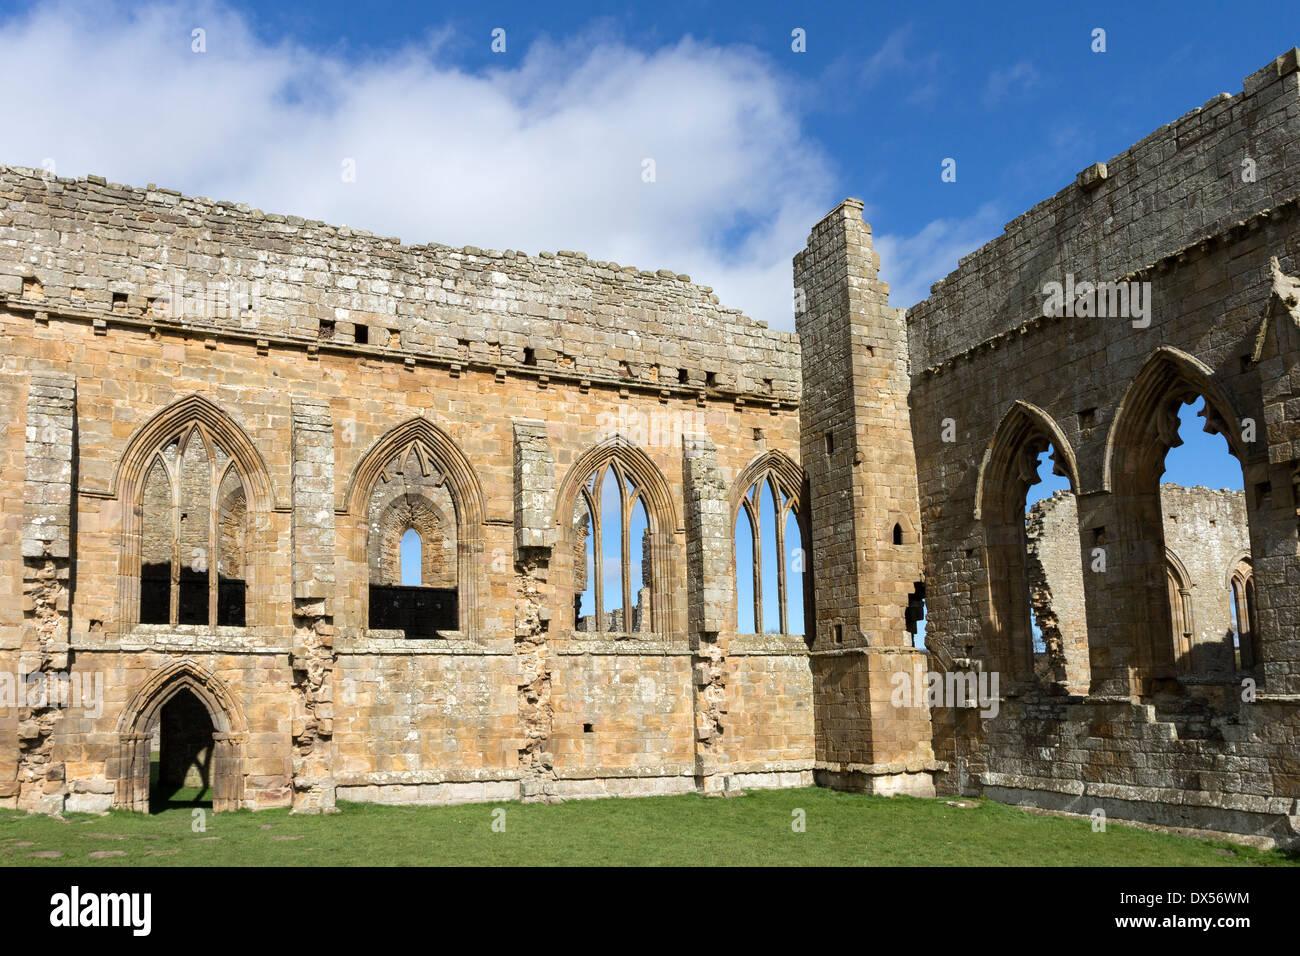 Egglestone Abbey Near Barnard Castle County Durham UK - Stock Image